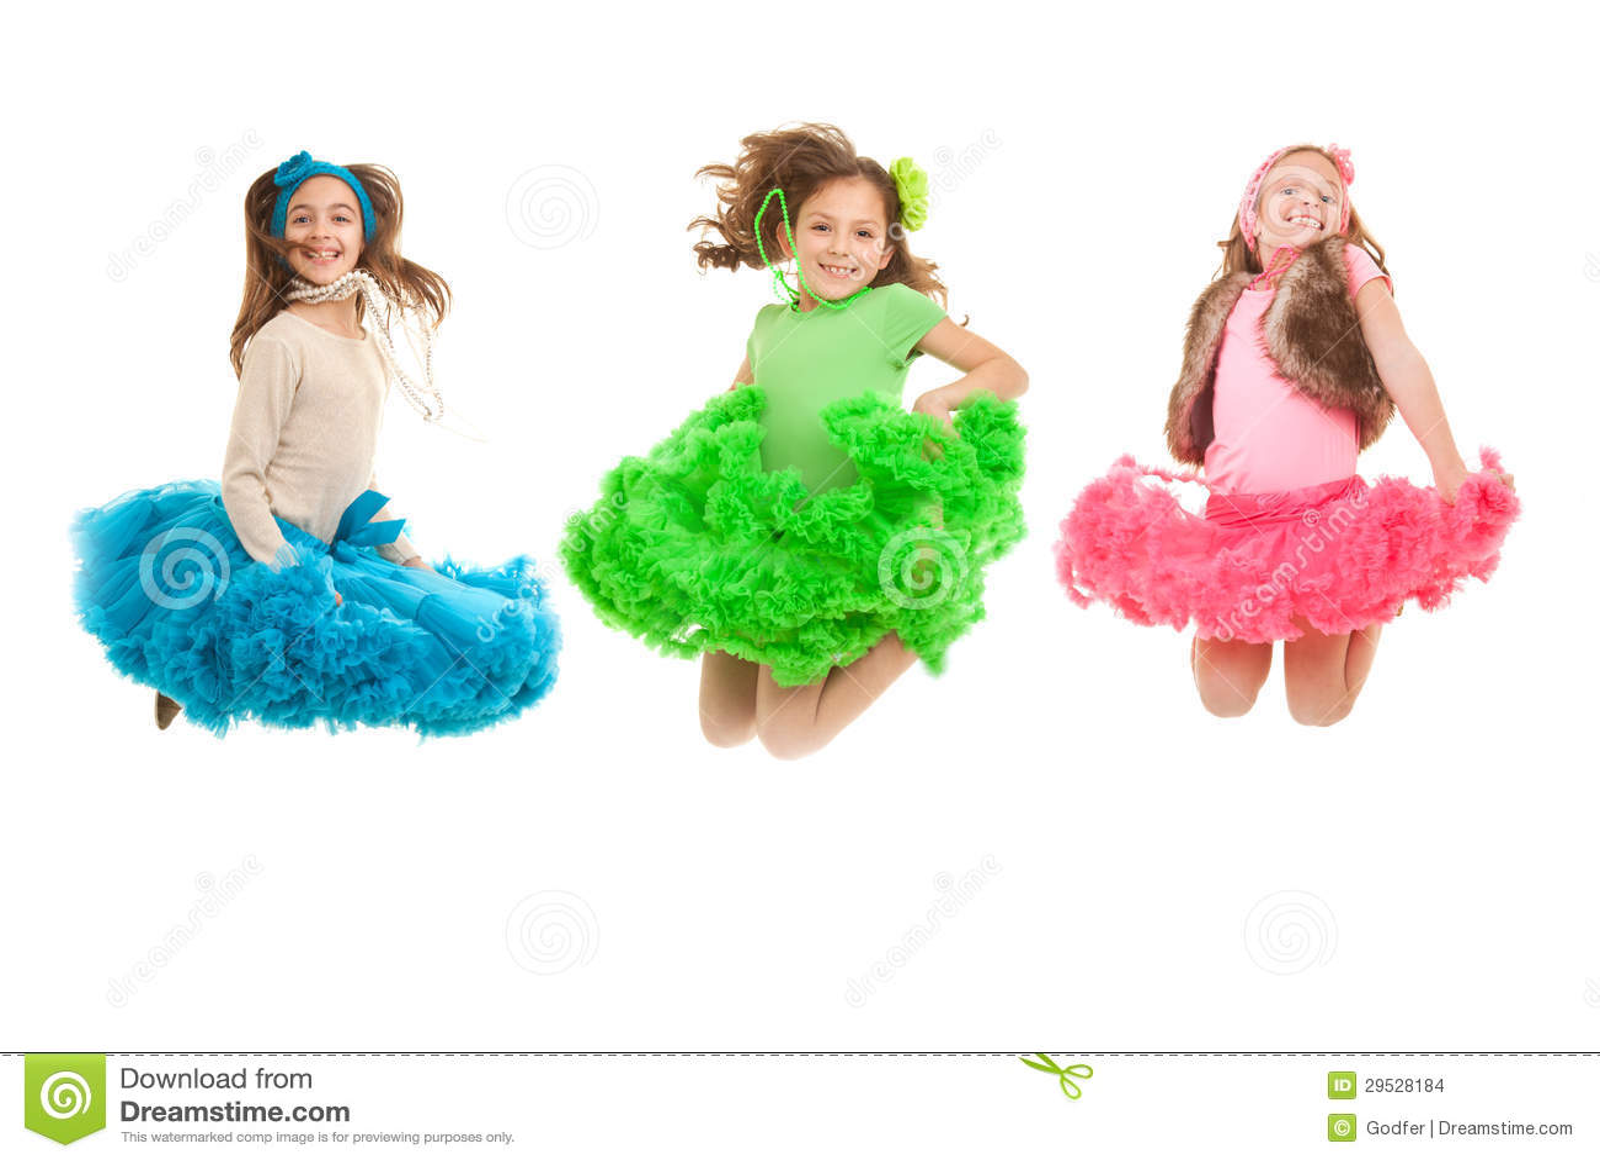 Fashion kids jumping stock images image 29528184